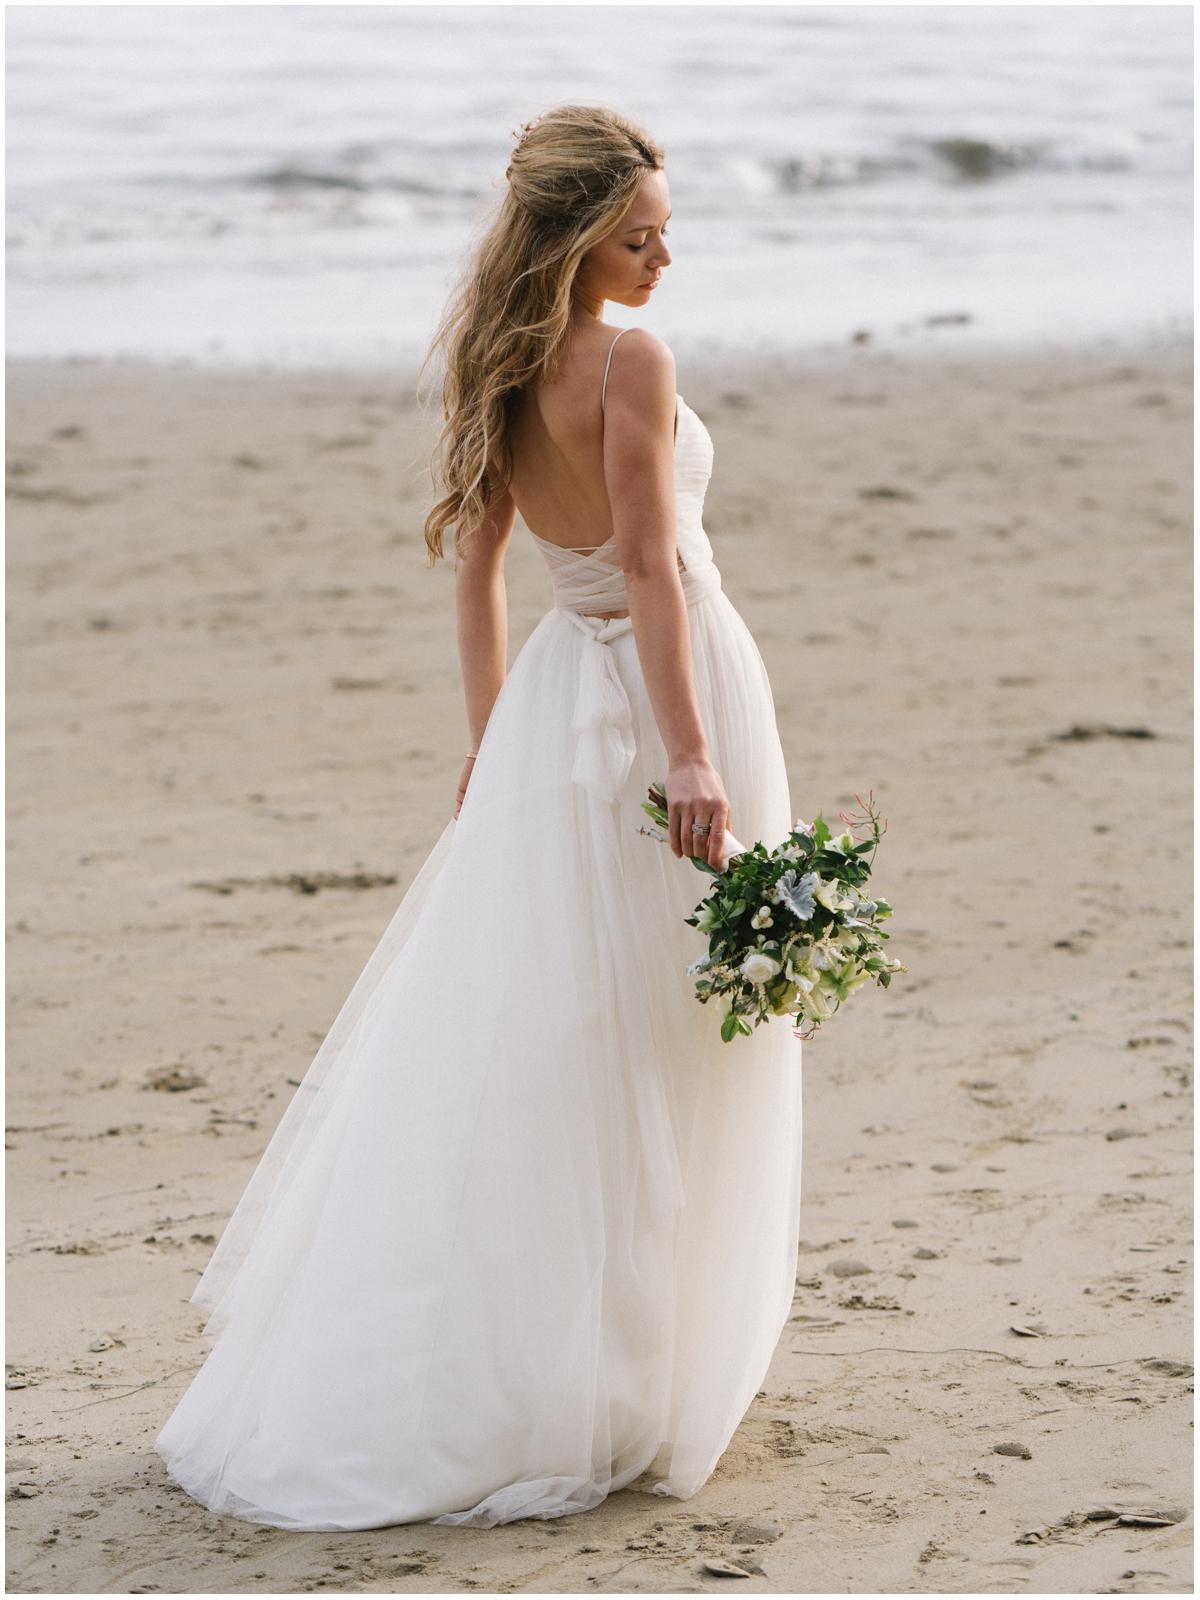 Santa Babara Elopement Wedding Photographer - Pinnel Photography-01-13.jpg